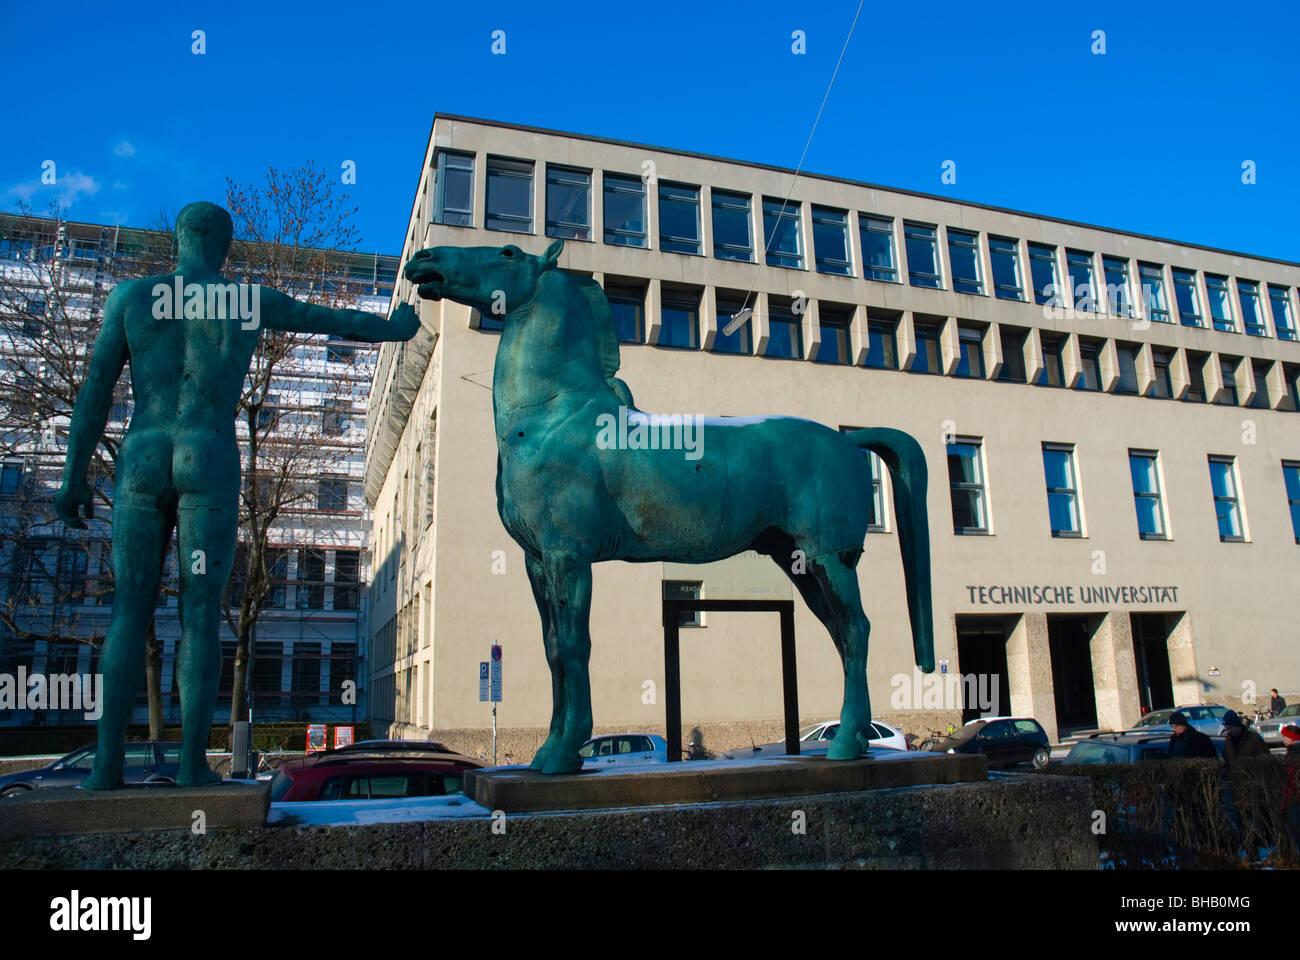 Wunden der Erinnerung Statue in front of Technical University Schwabing Munich Bavaria Germany Europe - Stock Image